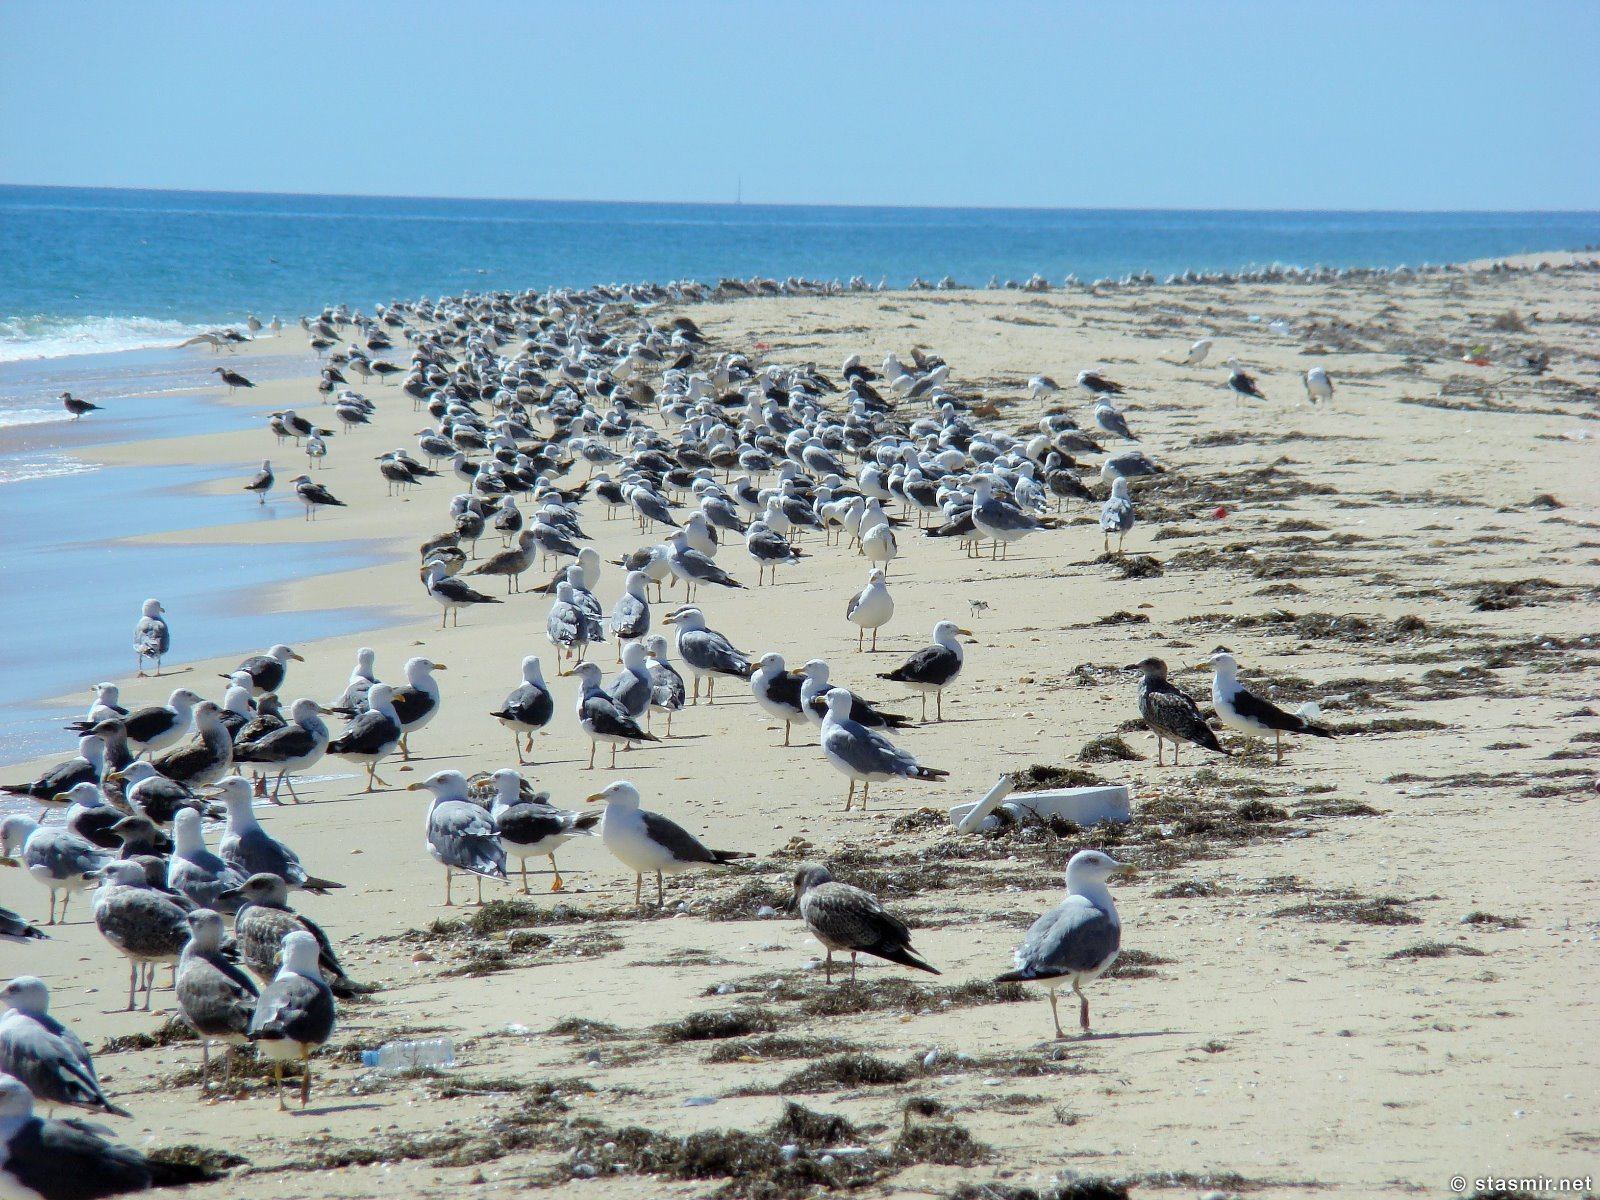 птицы на Ria Formosa или Риа-Формоза, Ilha Deserta, Algarve, пляж в Алгарве, фото Стасмир, Photo Stasmir